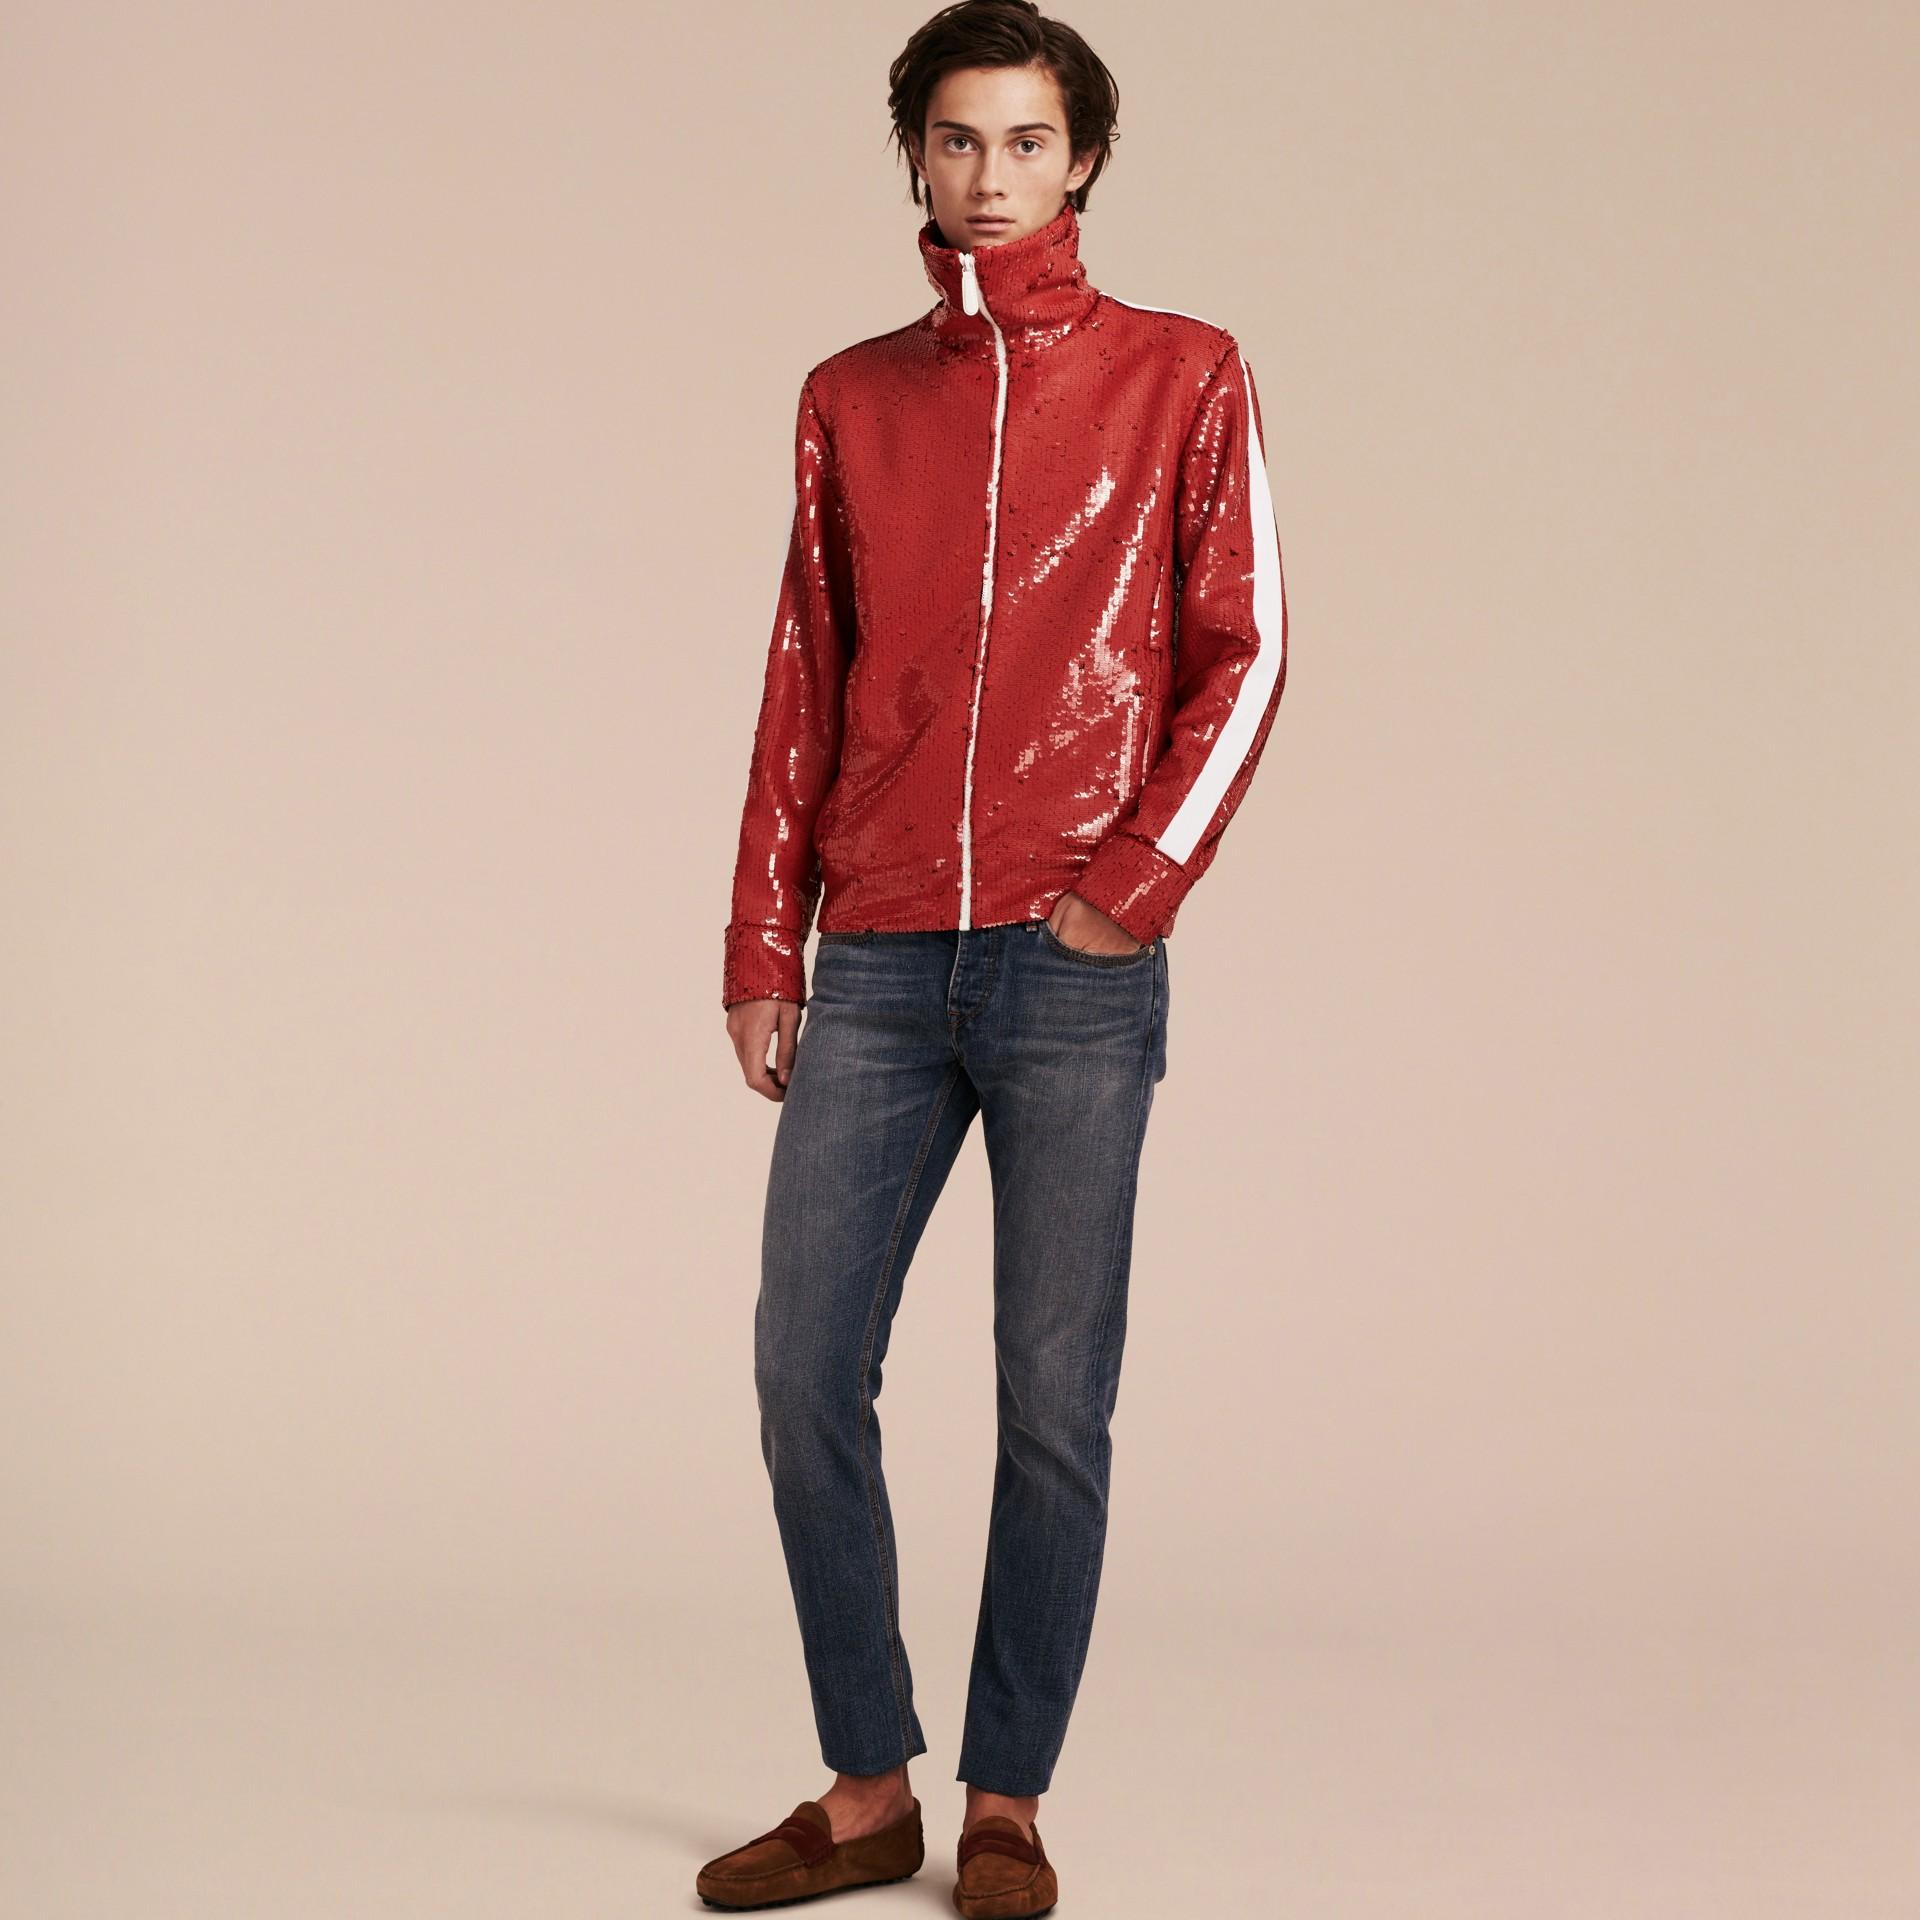 Cranberry-rot Trainingsjacke mit Pailletten - Galerie-Bild 7